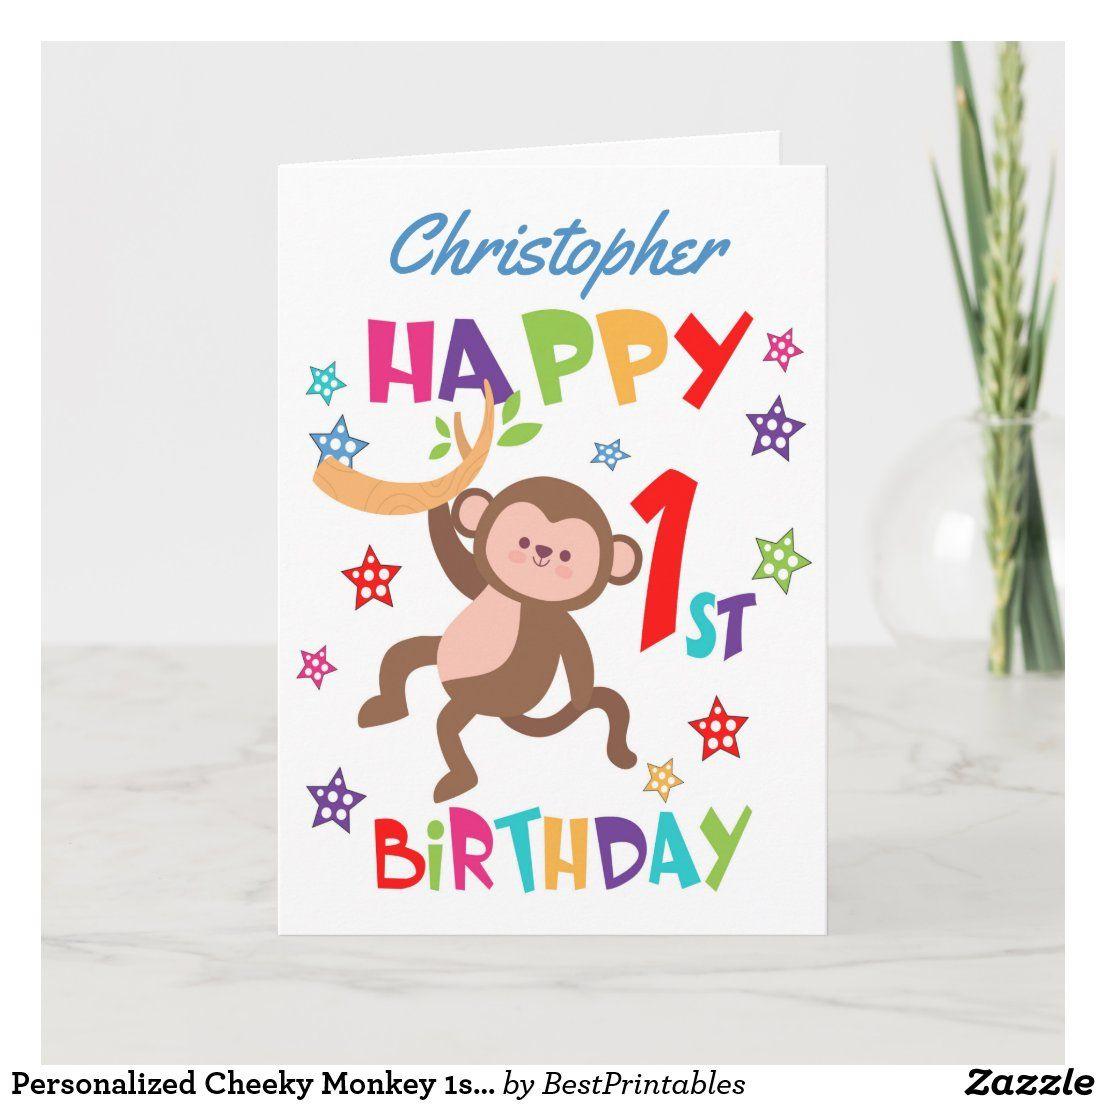 Personalized Cheeky Monkey 1st Birthday Card Zazzle Com 1st Birthday Cards Birthday Cards Baby Birthday Card